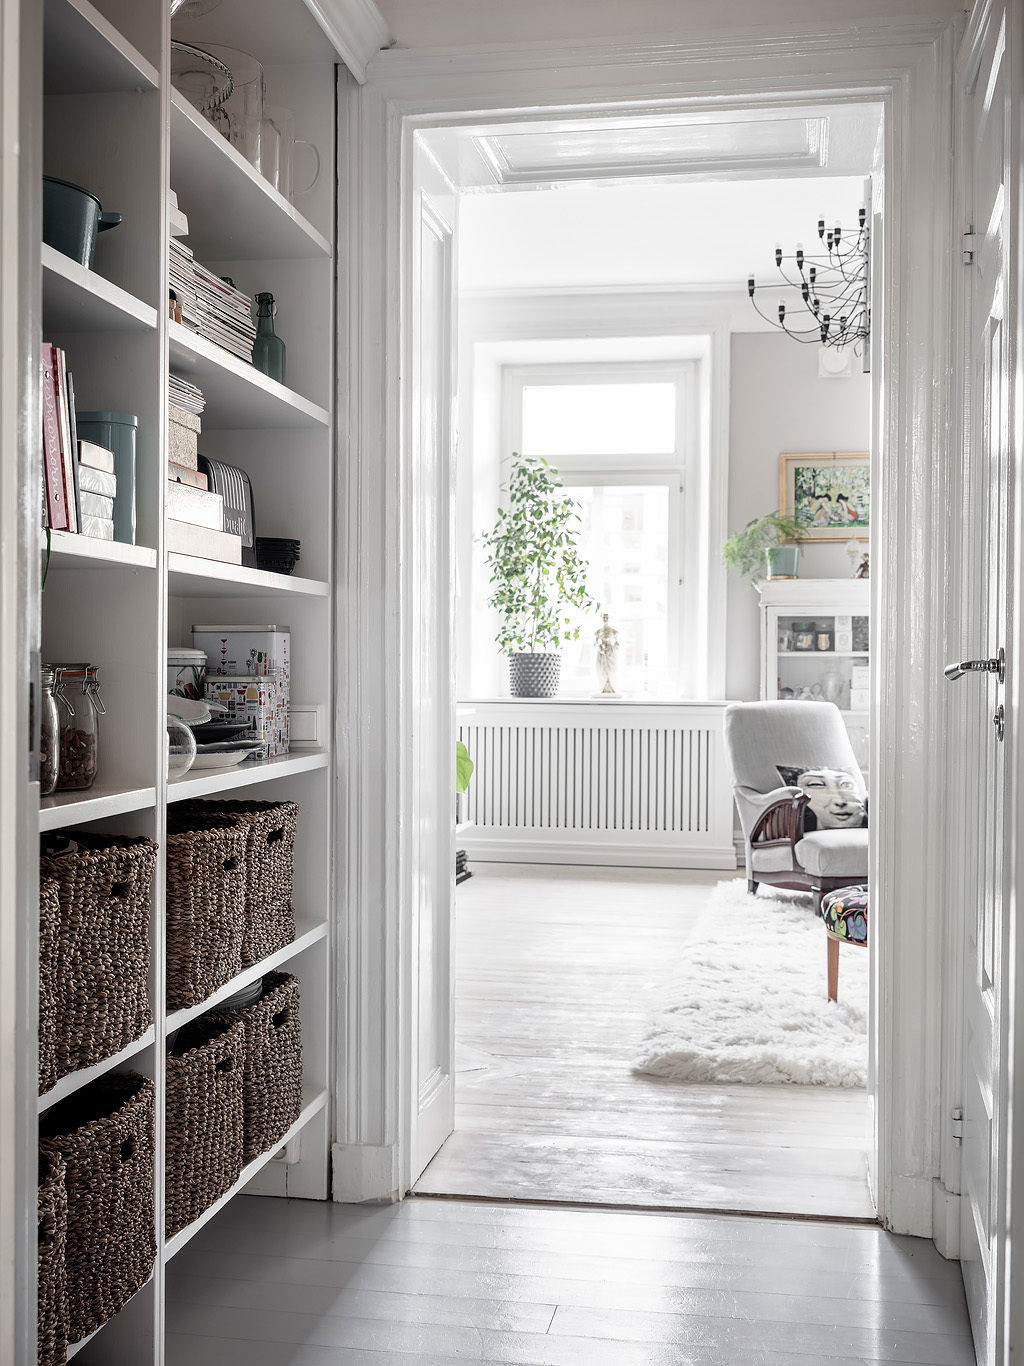 Interiores que son puro arte interiores chic blog de for Blog decoracion interiores